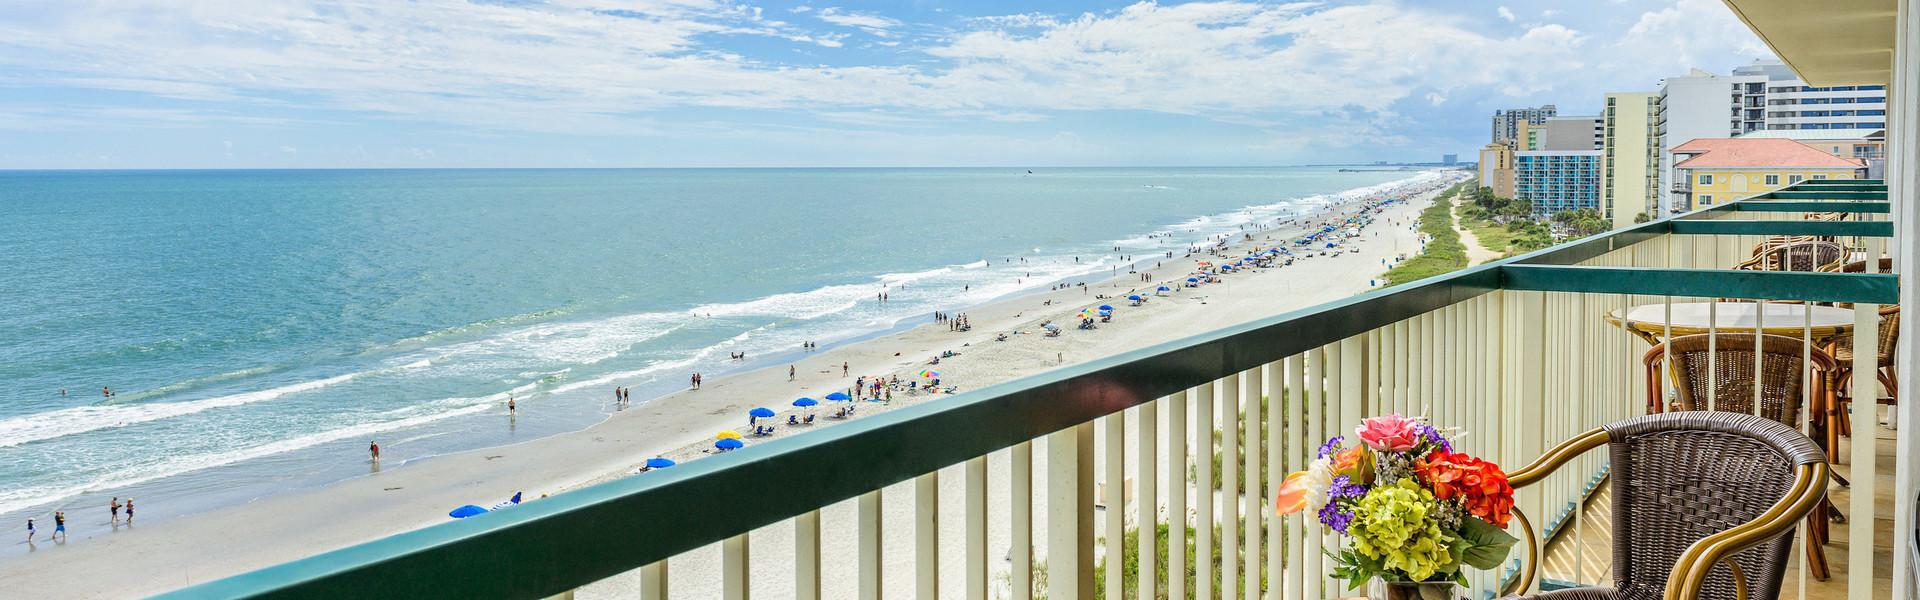 2 Bedroom Oceanfront Suite at our Myrtle Beach Hotel | Oceanfront Balcony